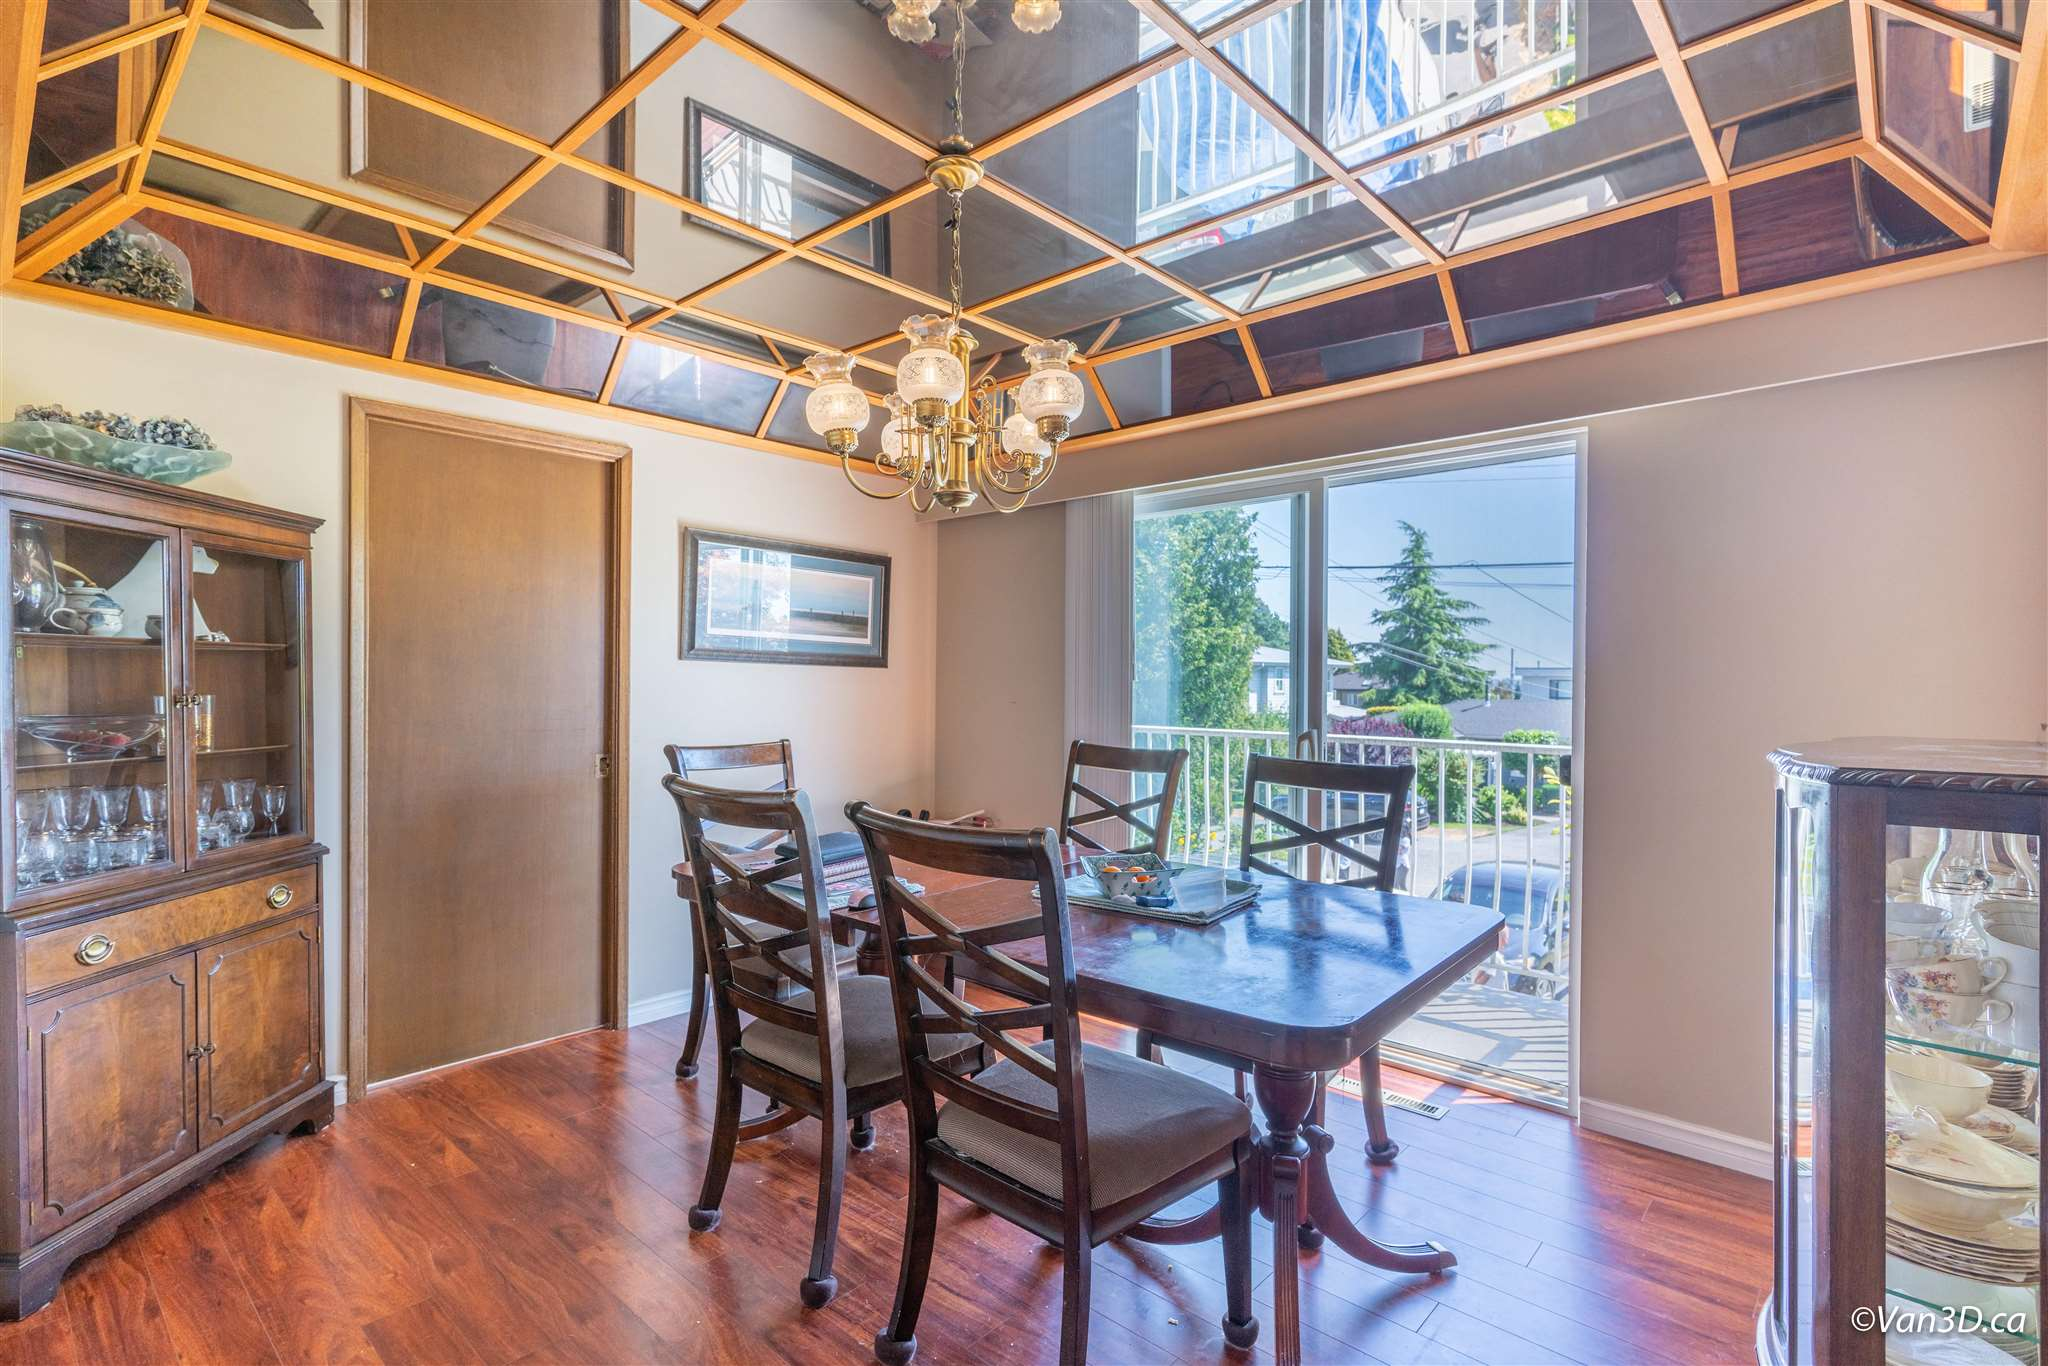 14495 MANN PARK CRESCENT - White Rock House/Single Family for sale, 4 Bedrooms (R2604561) - #20